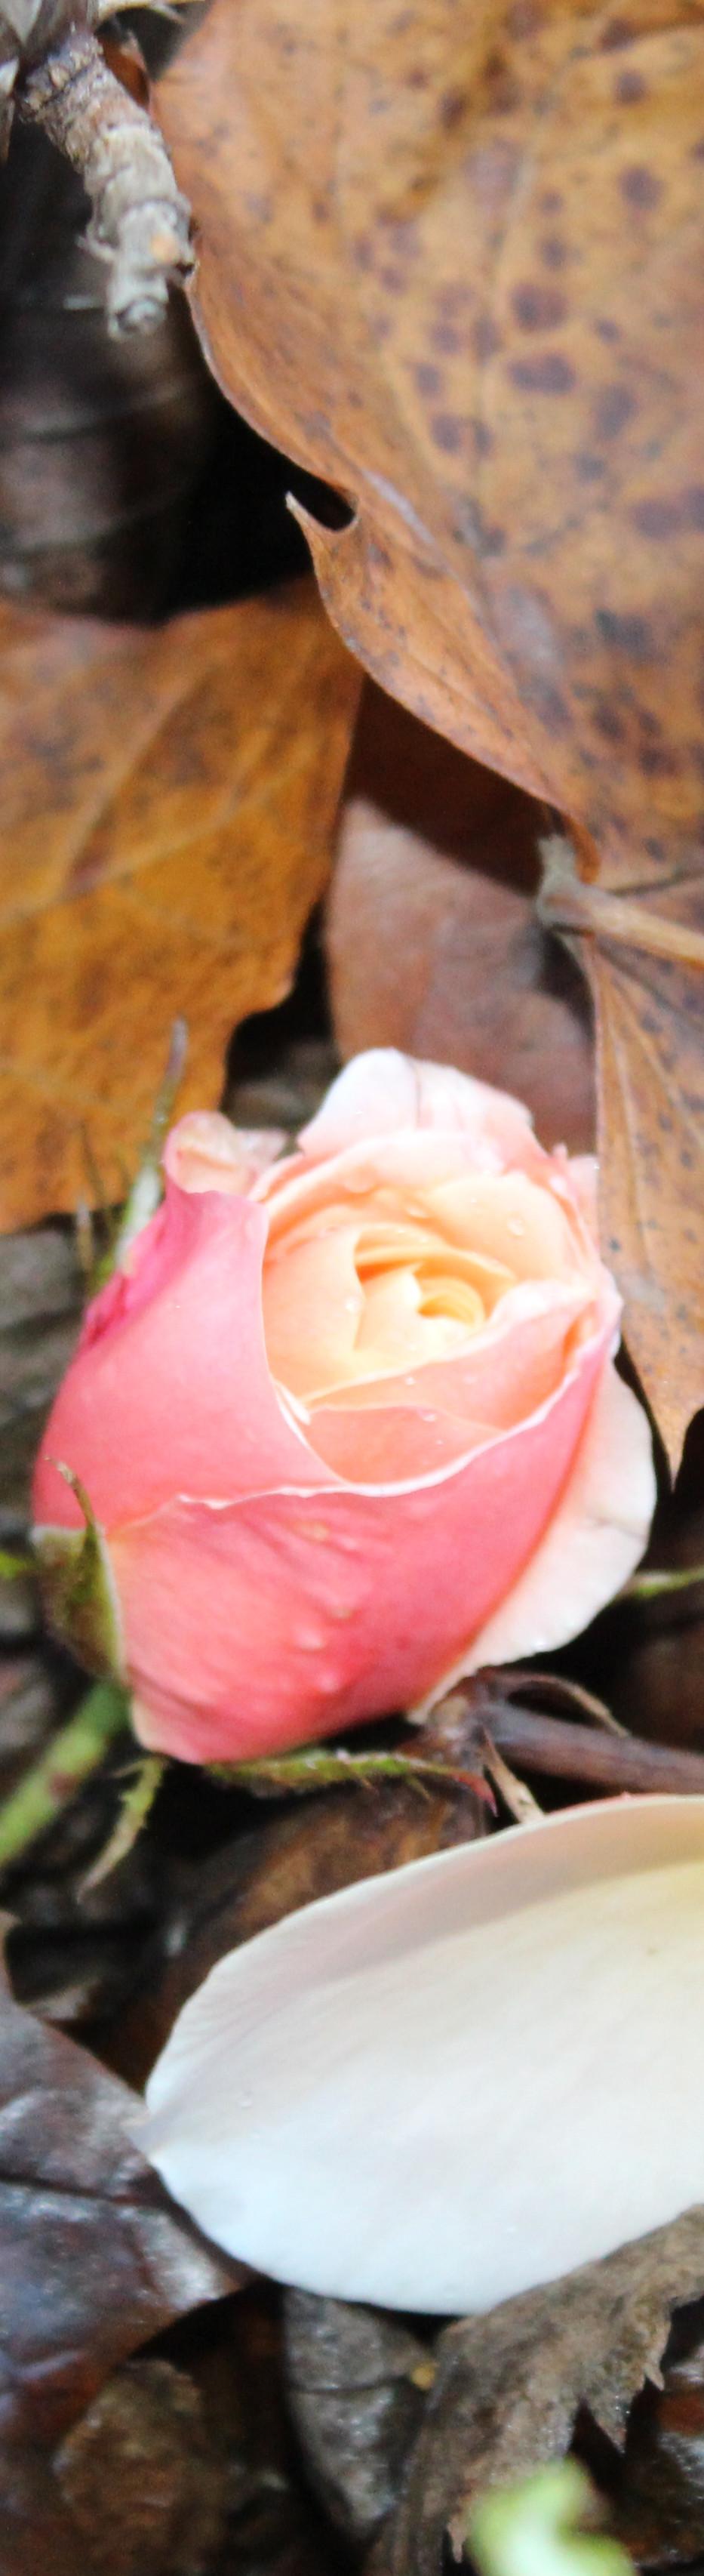 Rose Autumn Leaves